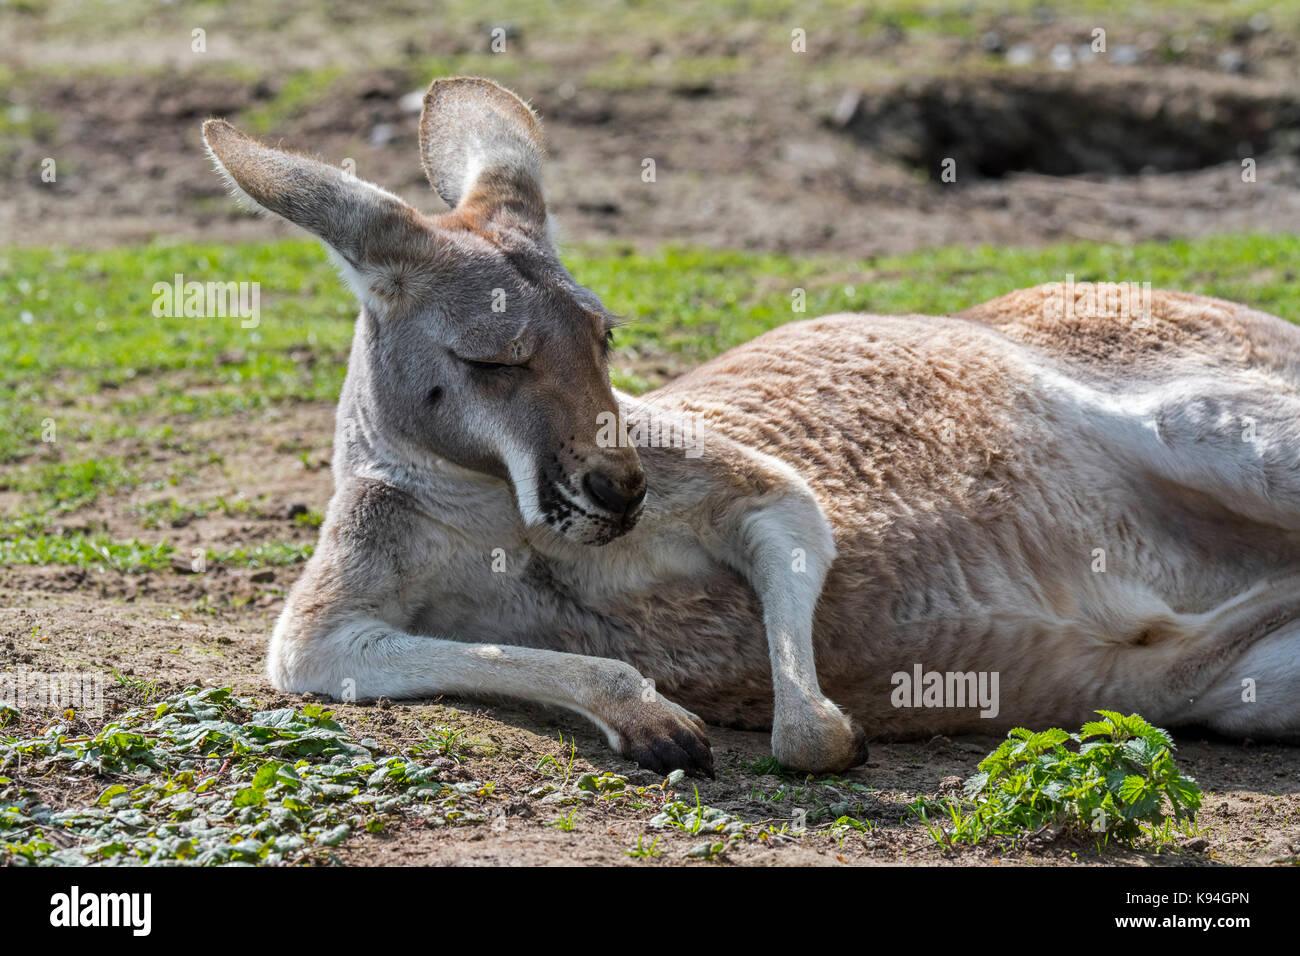 Close up of red kangaroo (Macropus rufus) female resting, native to Australia - Stock Image